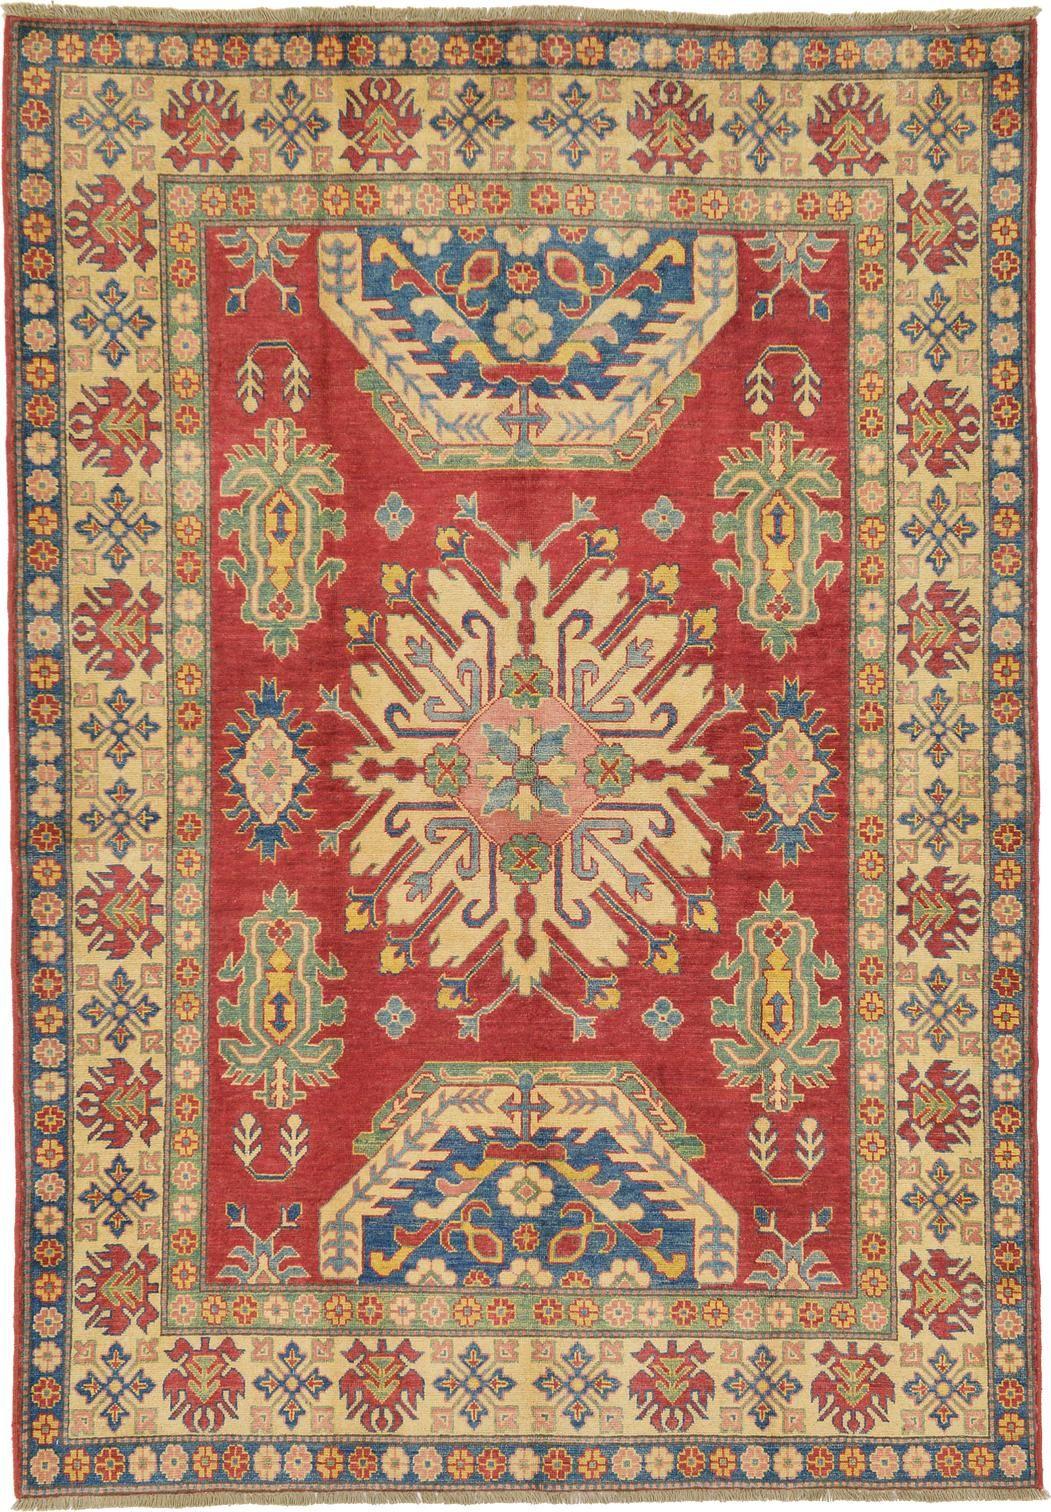 Red 6 1 X 8 9 Geometric Kazak Oriental Rug Rugs